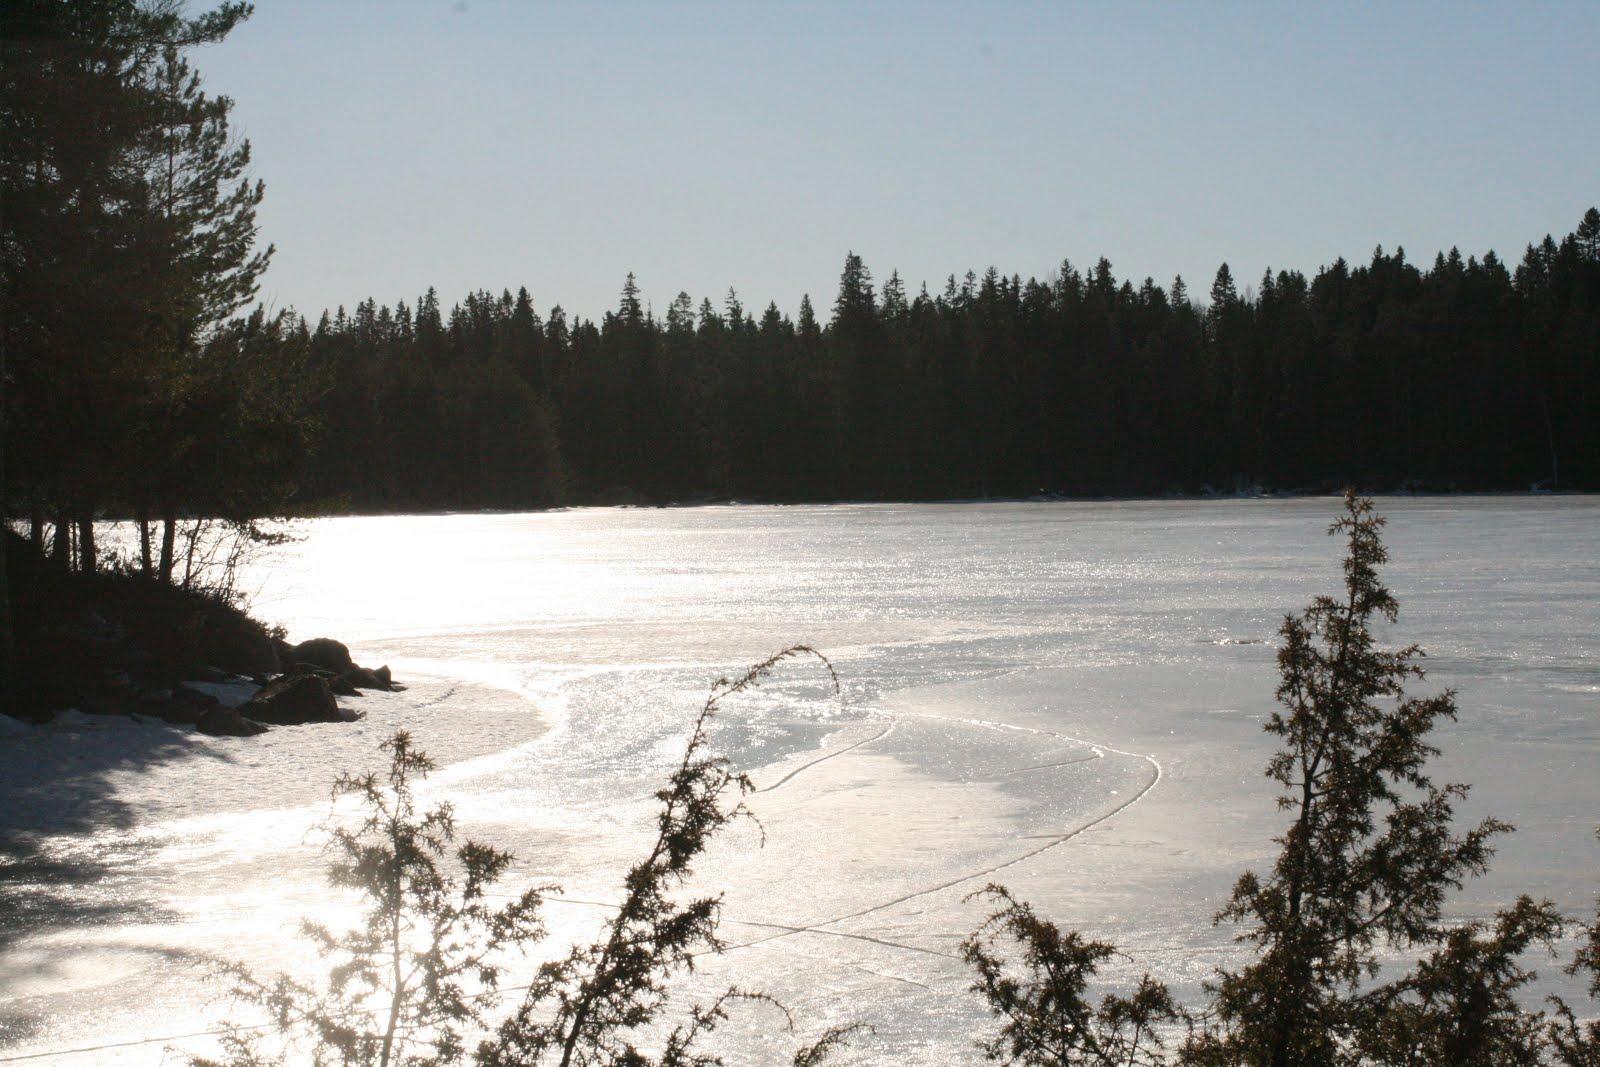 Mökkijärvi